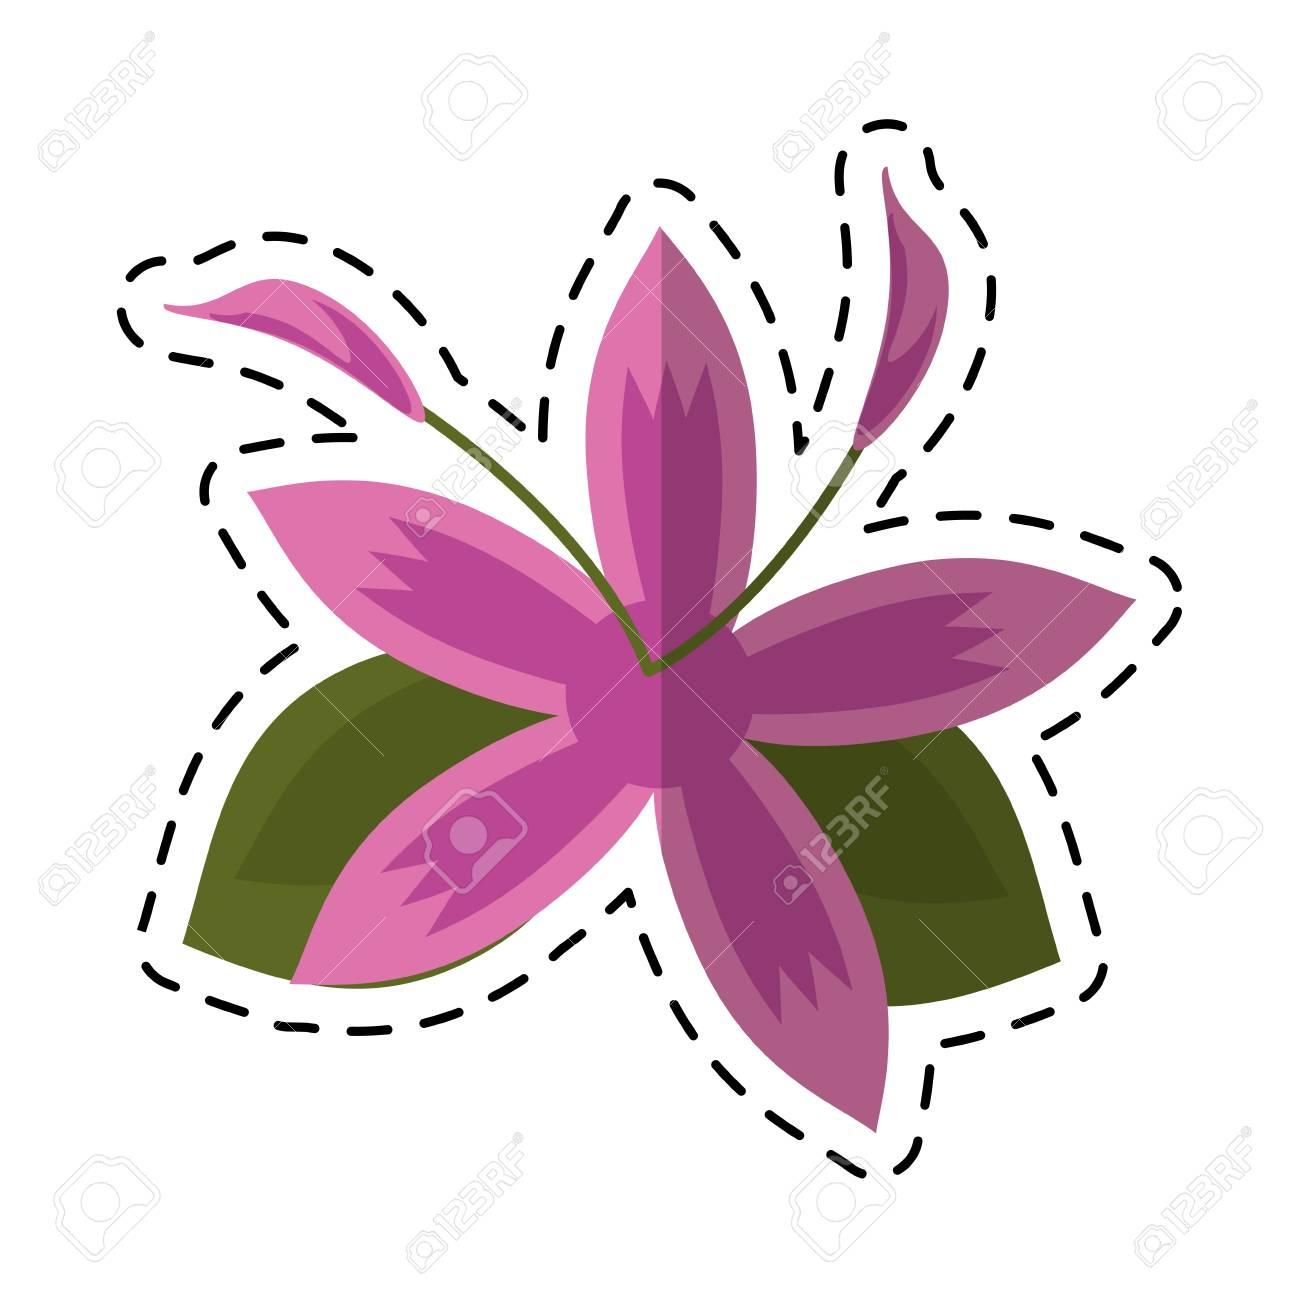 Cartoon flower daylily beautiful flora vector illustration eps cartoon flower daylily beautiful flora vector illustration eps 10 stock vector 72858320 izmirmasajfo